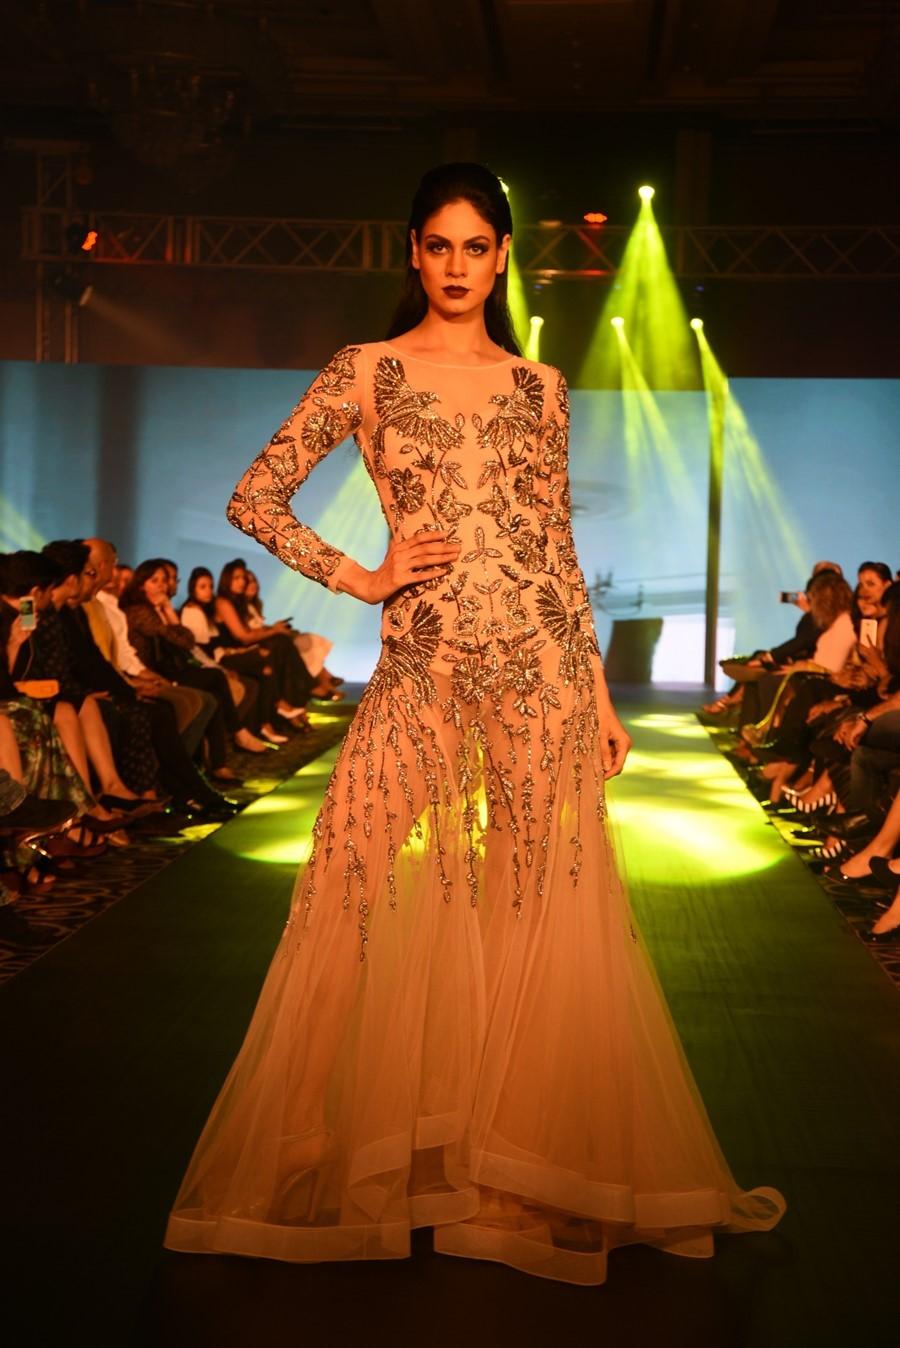 rajat-tangri-numaish-winter-show-dubai-fashion-indian-designer-blog-1